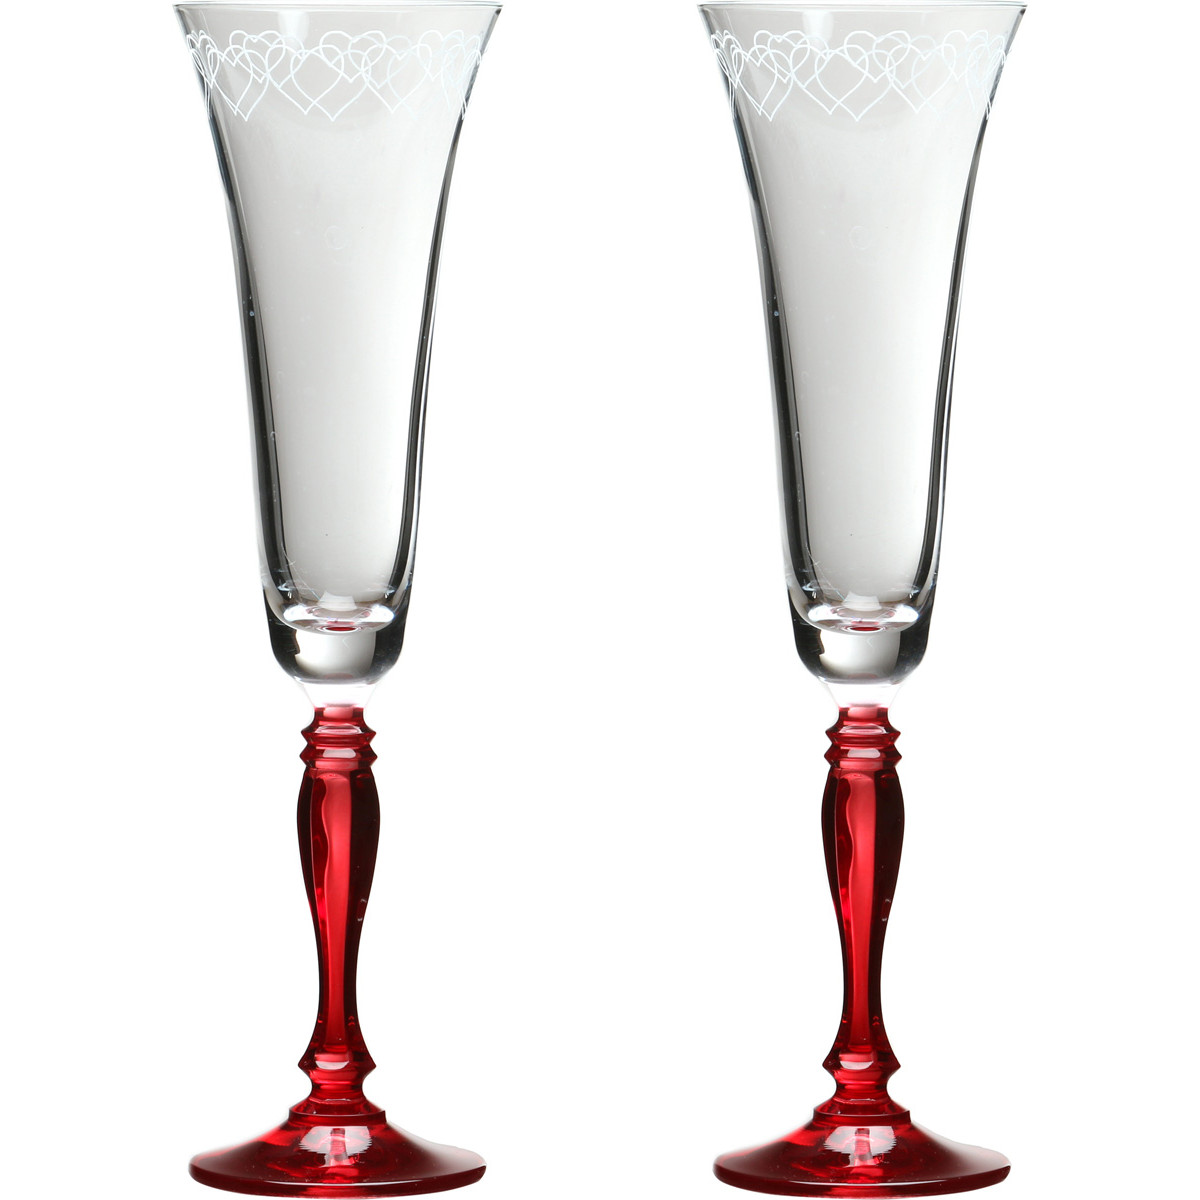 {} Bohemia Crystal Набор бокалов для шампанского Boaz  (25 см - 2 шт) набор для специй crystal bohemia тыква 2 предмета